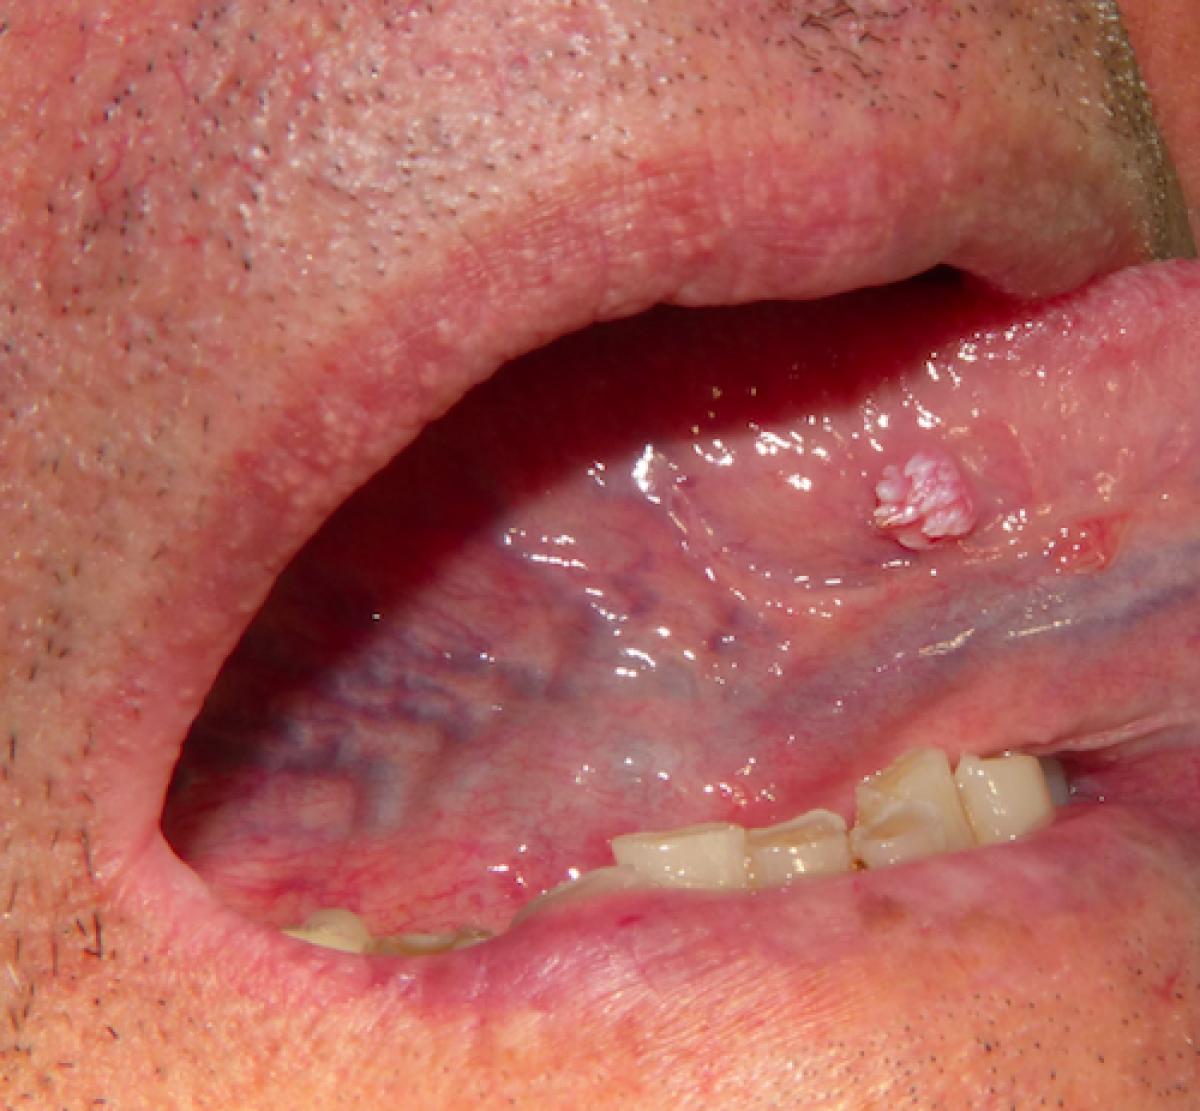 papillary lesion under tongue